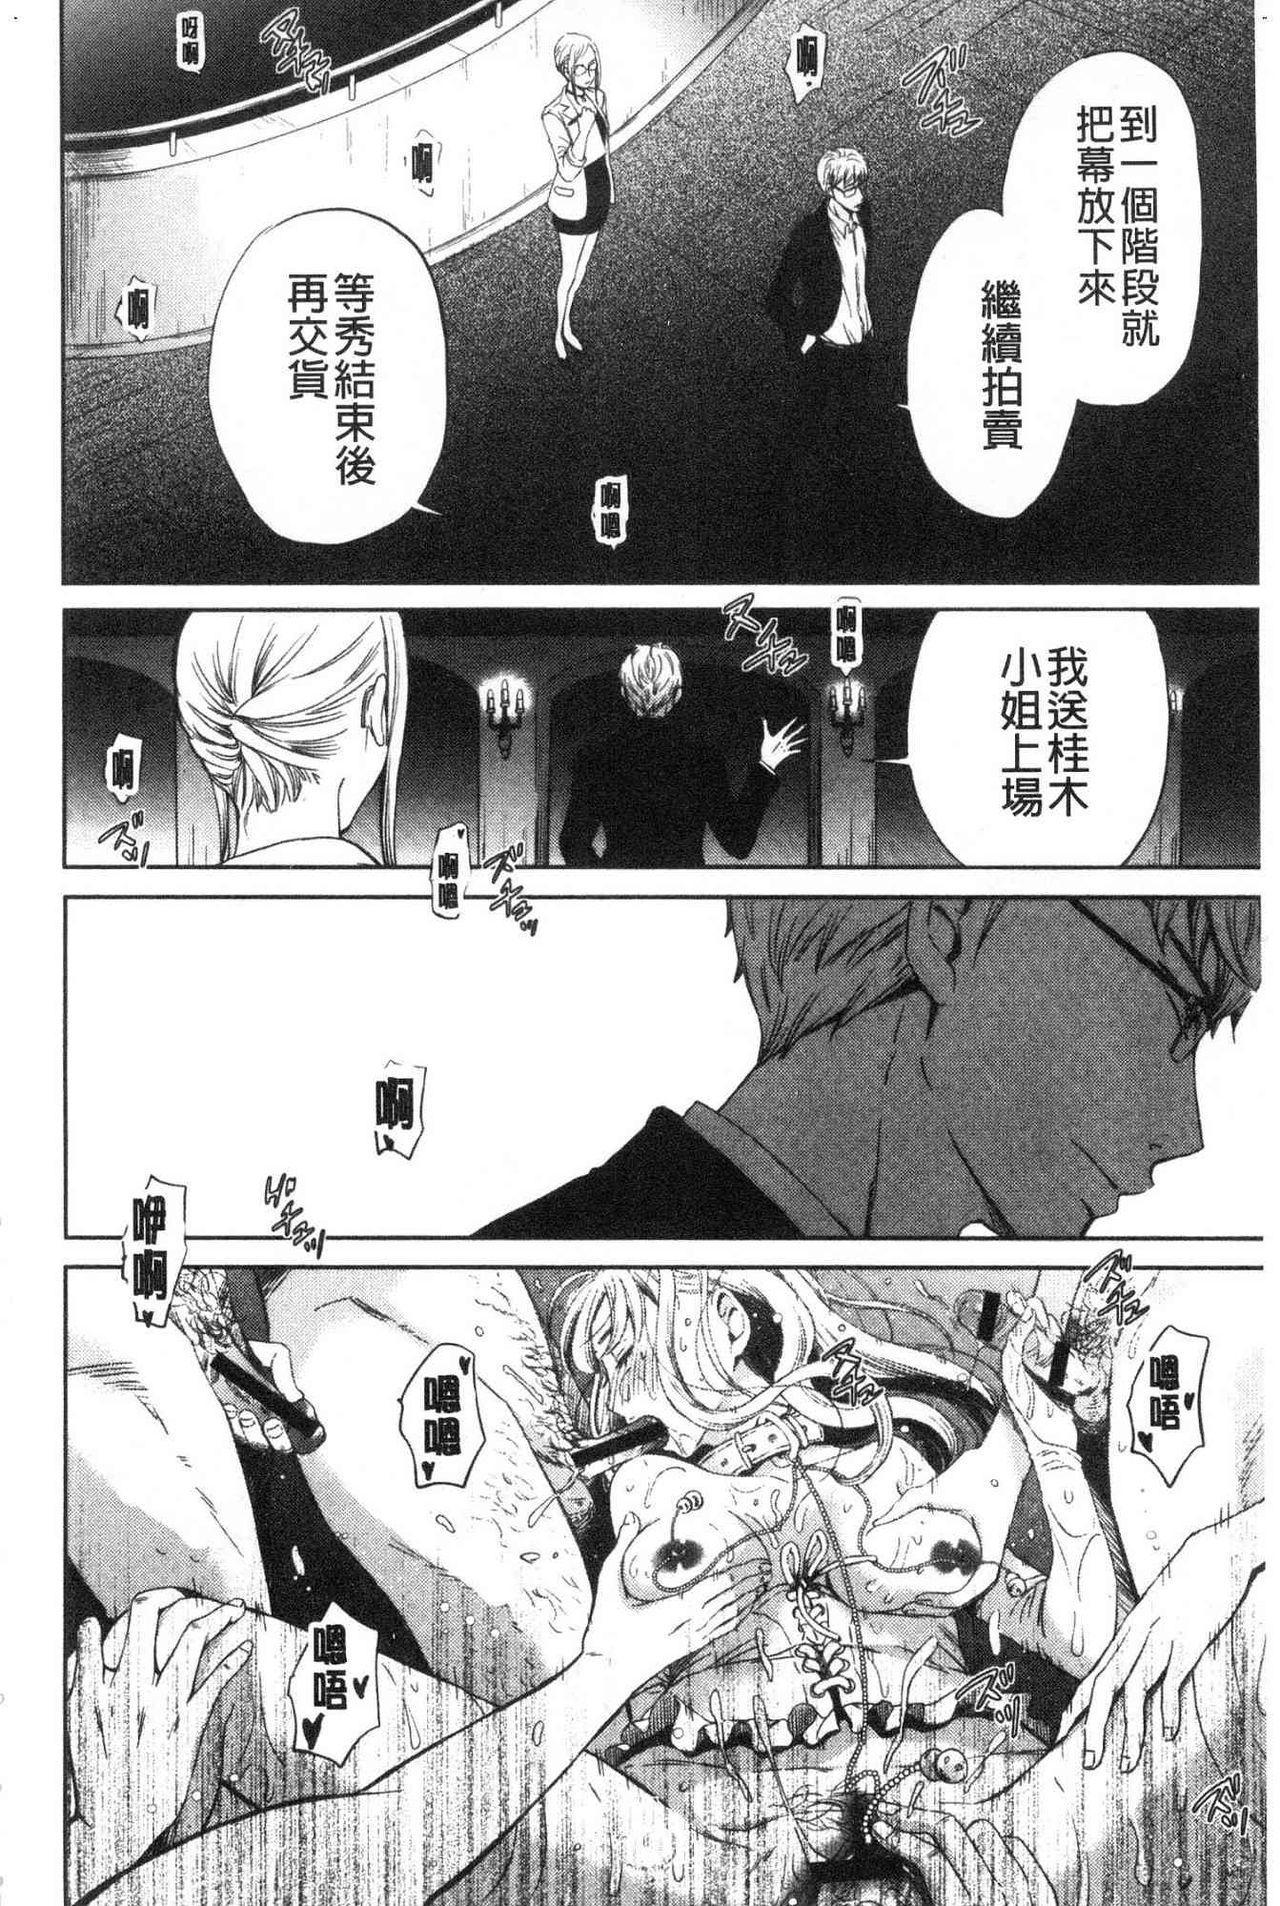 [Gotoh Akira]  21-ji no Onna ~Camera no Mae no Mesuinu~ 2 | 21時之女 ~鏡頭前的牝犬~ 2 [Chinese] 189